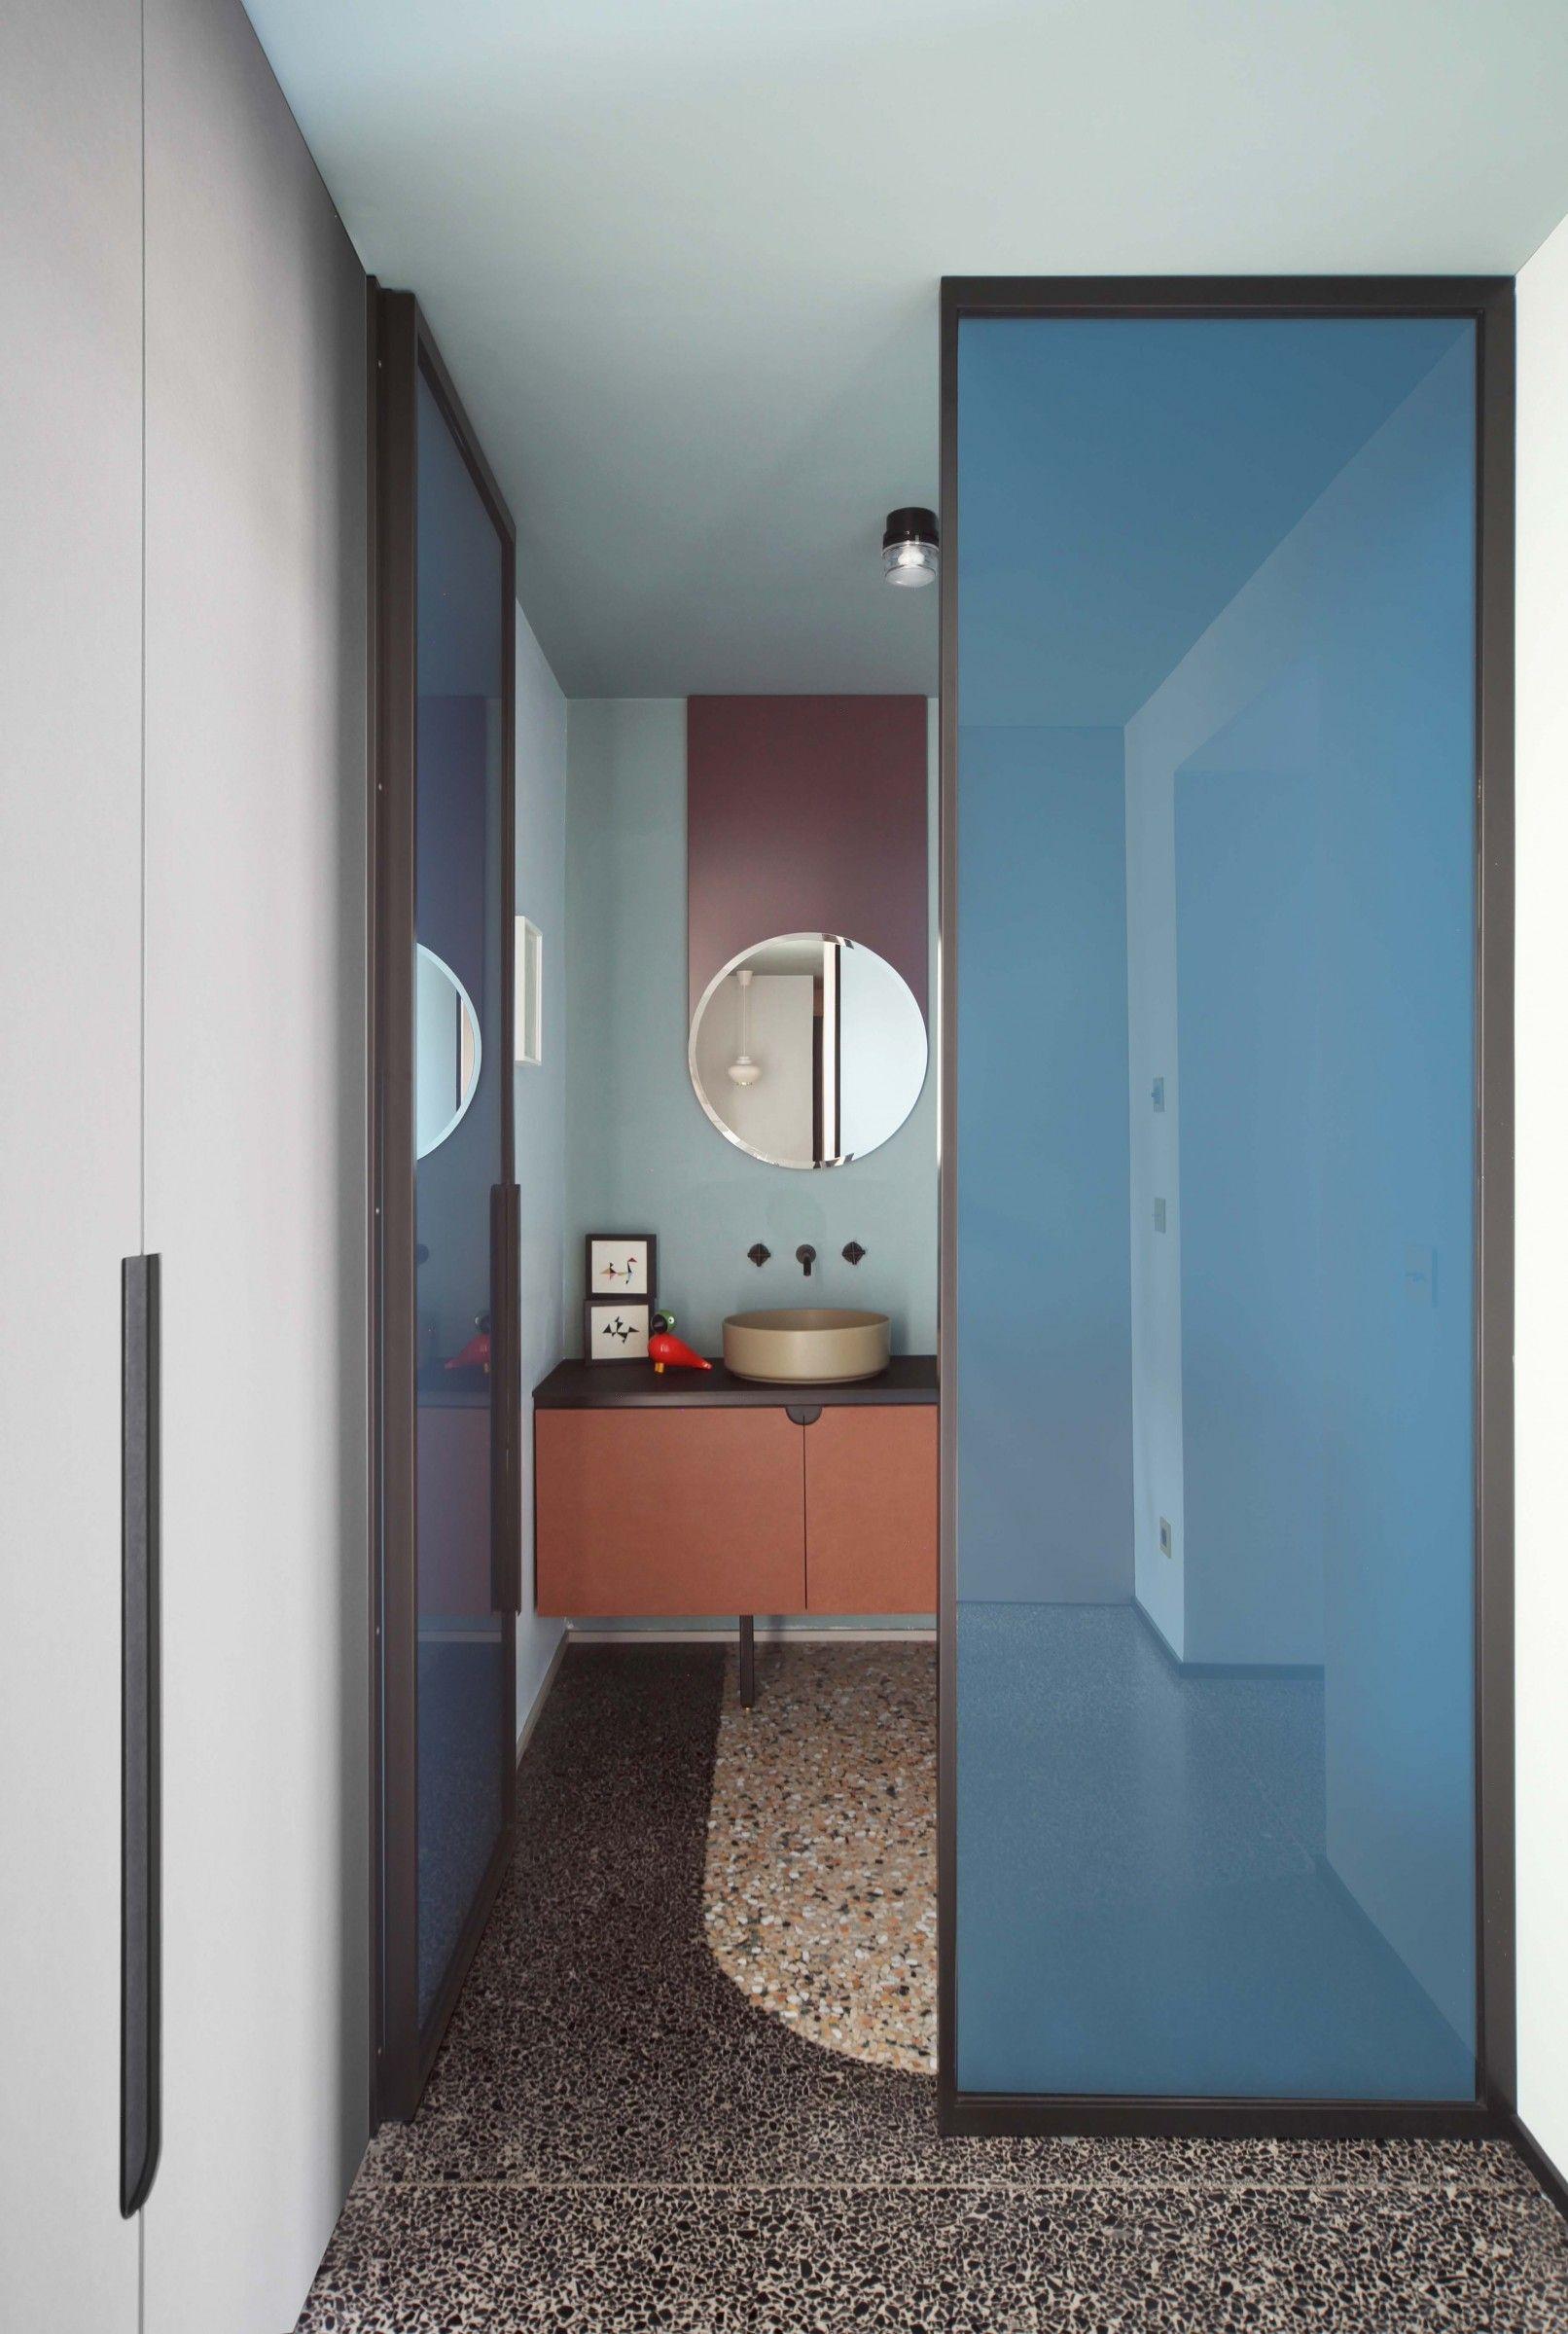 Accessoire Salle De Bain Terrazzo ~ milda f rger och terrazzo i vacker mix pinterest salle de bains